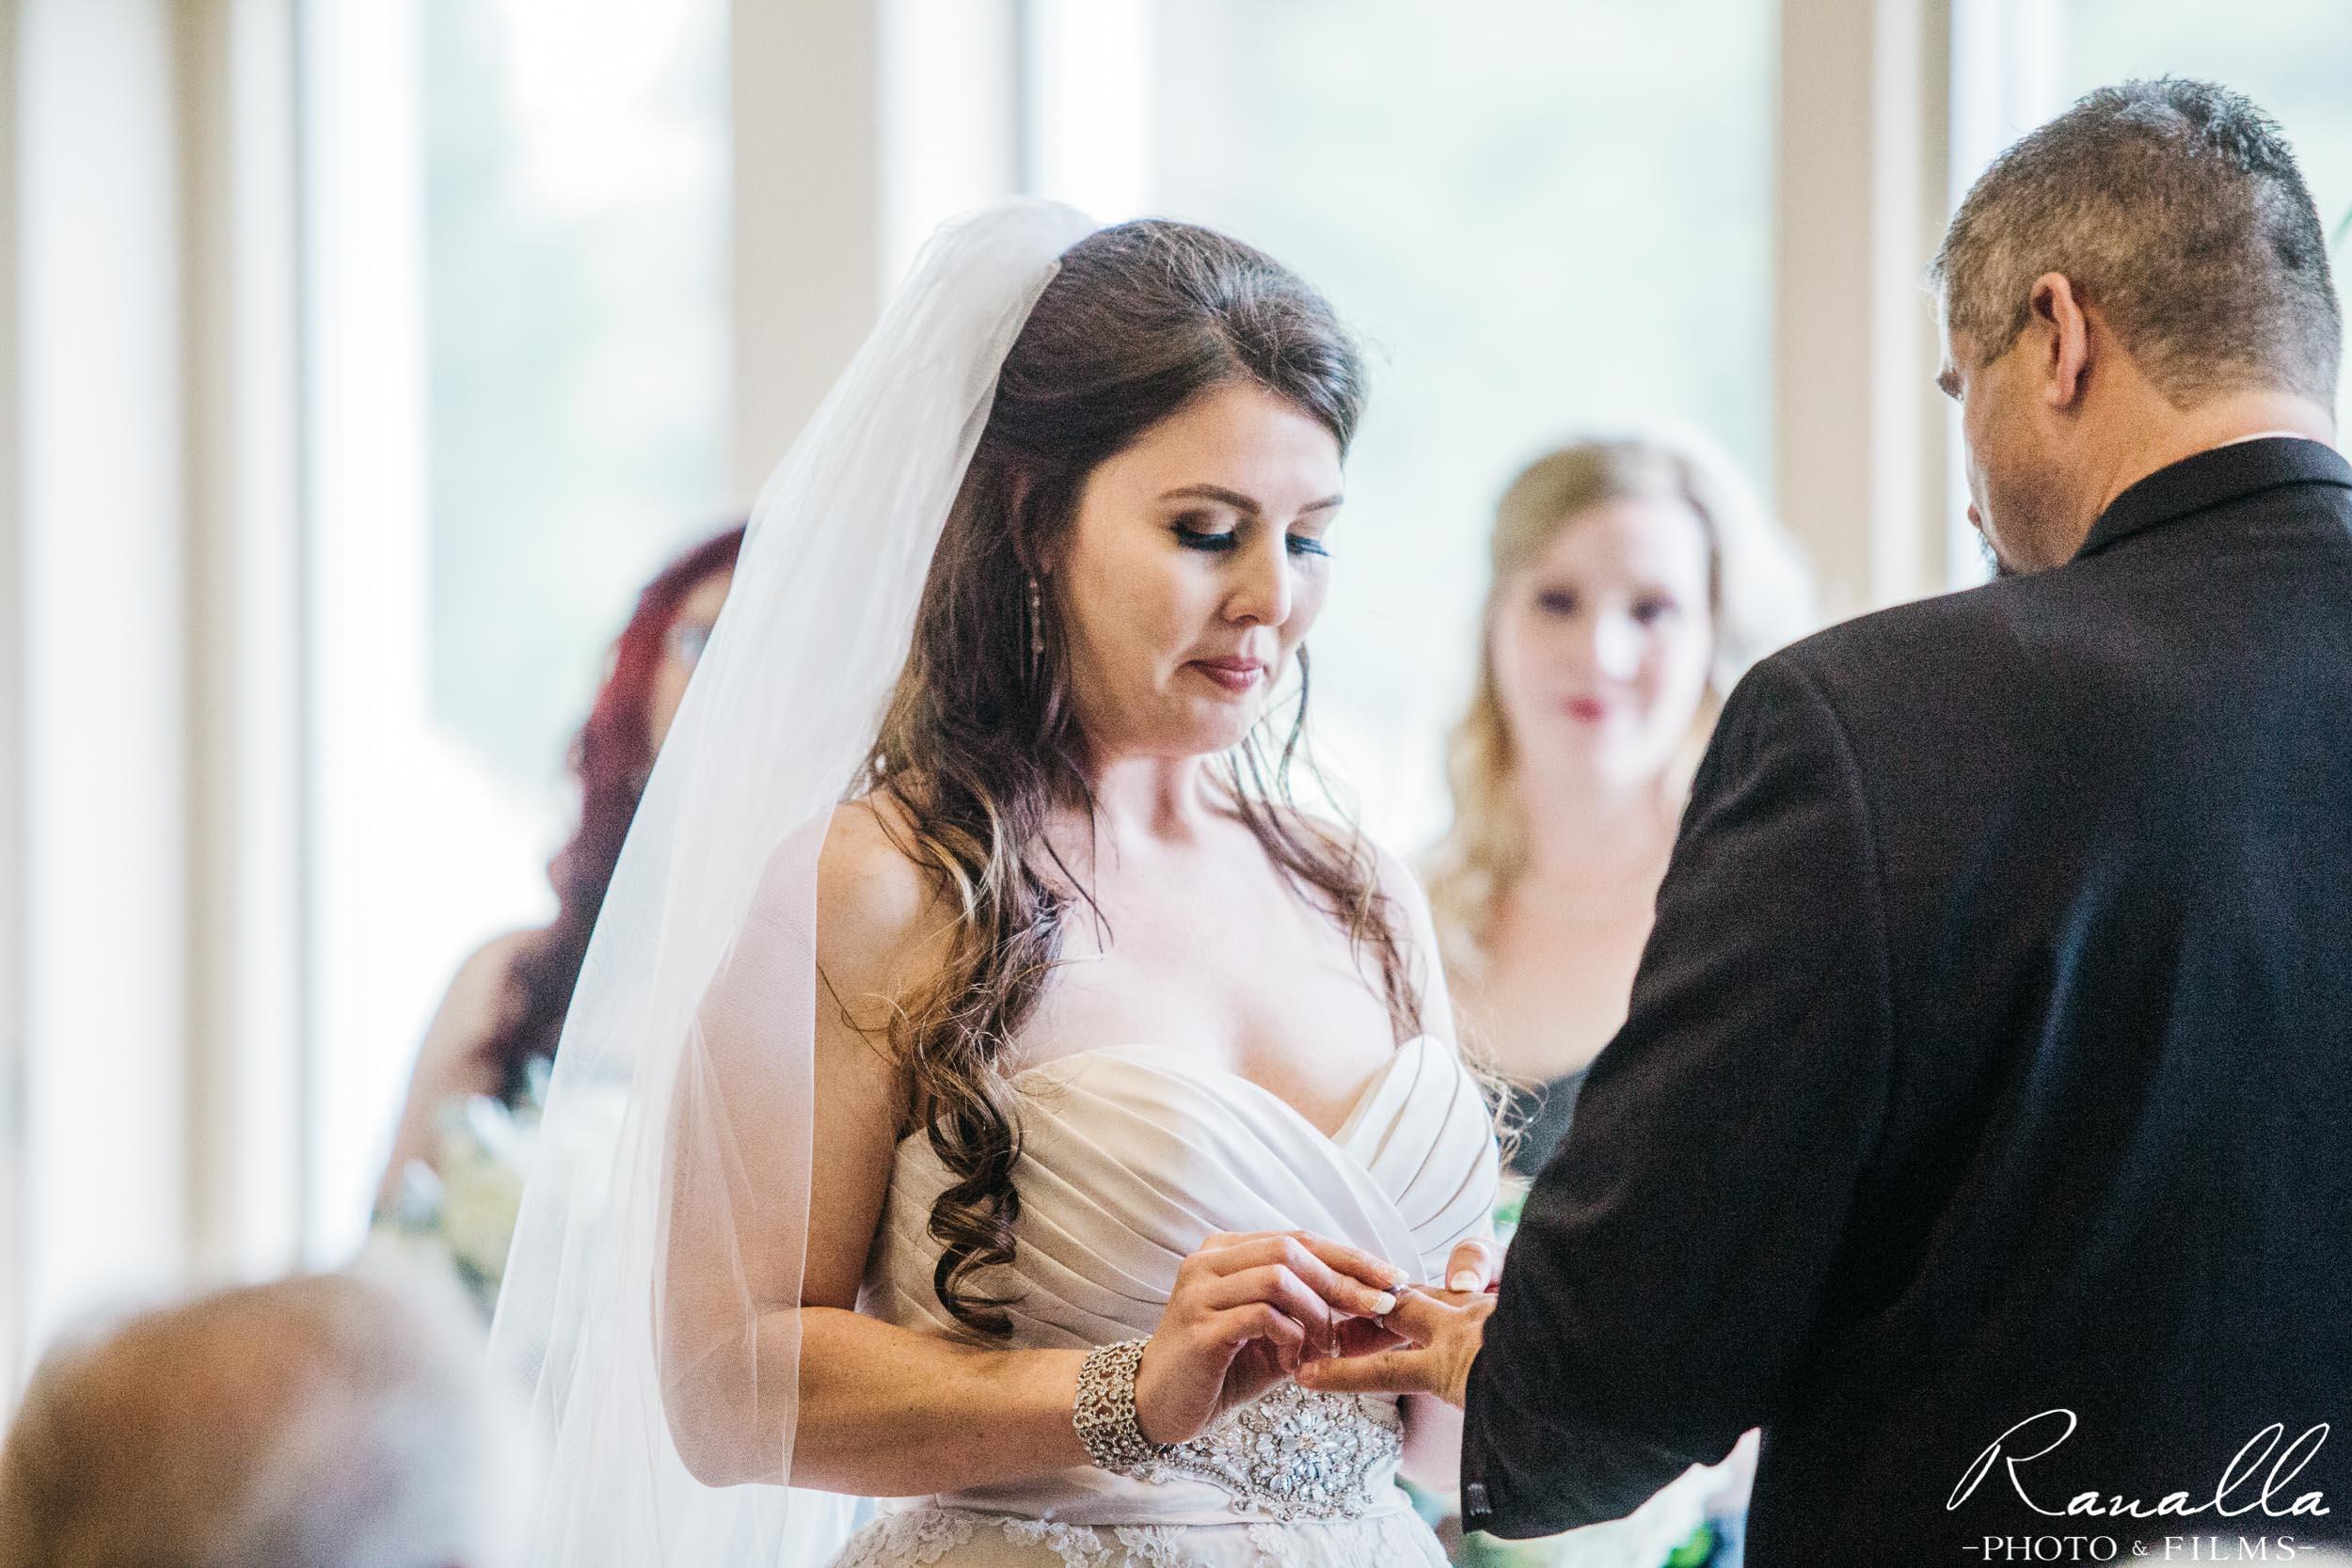 butte creek country club wedding - chico wedding photography - ranalla photo & films-634.jpg